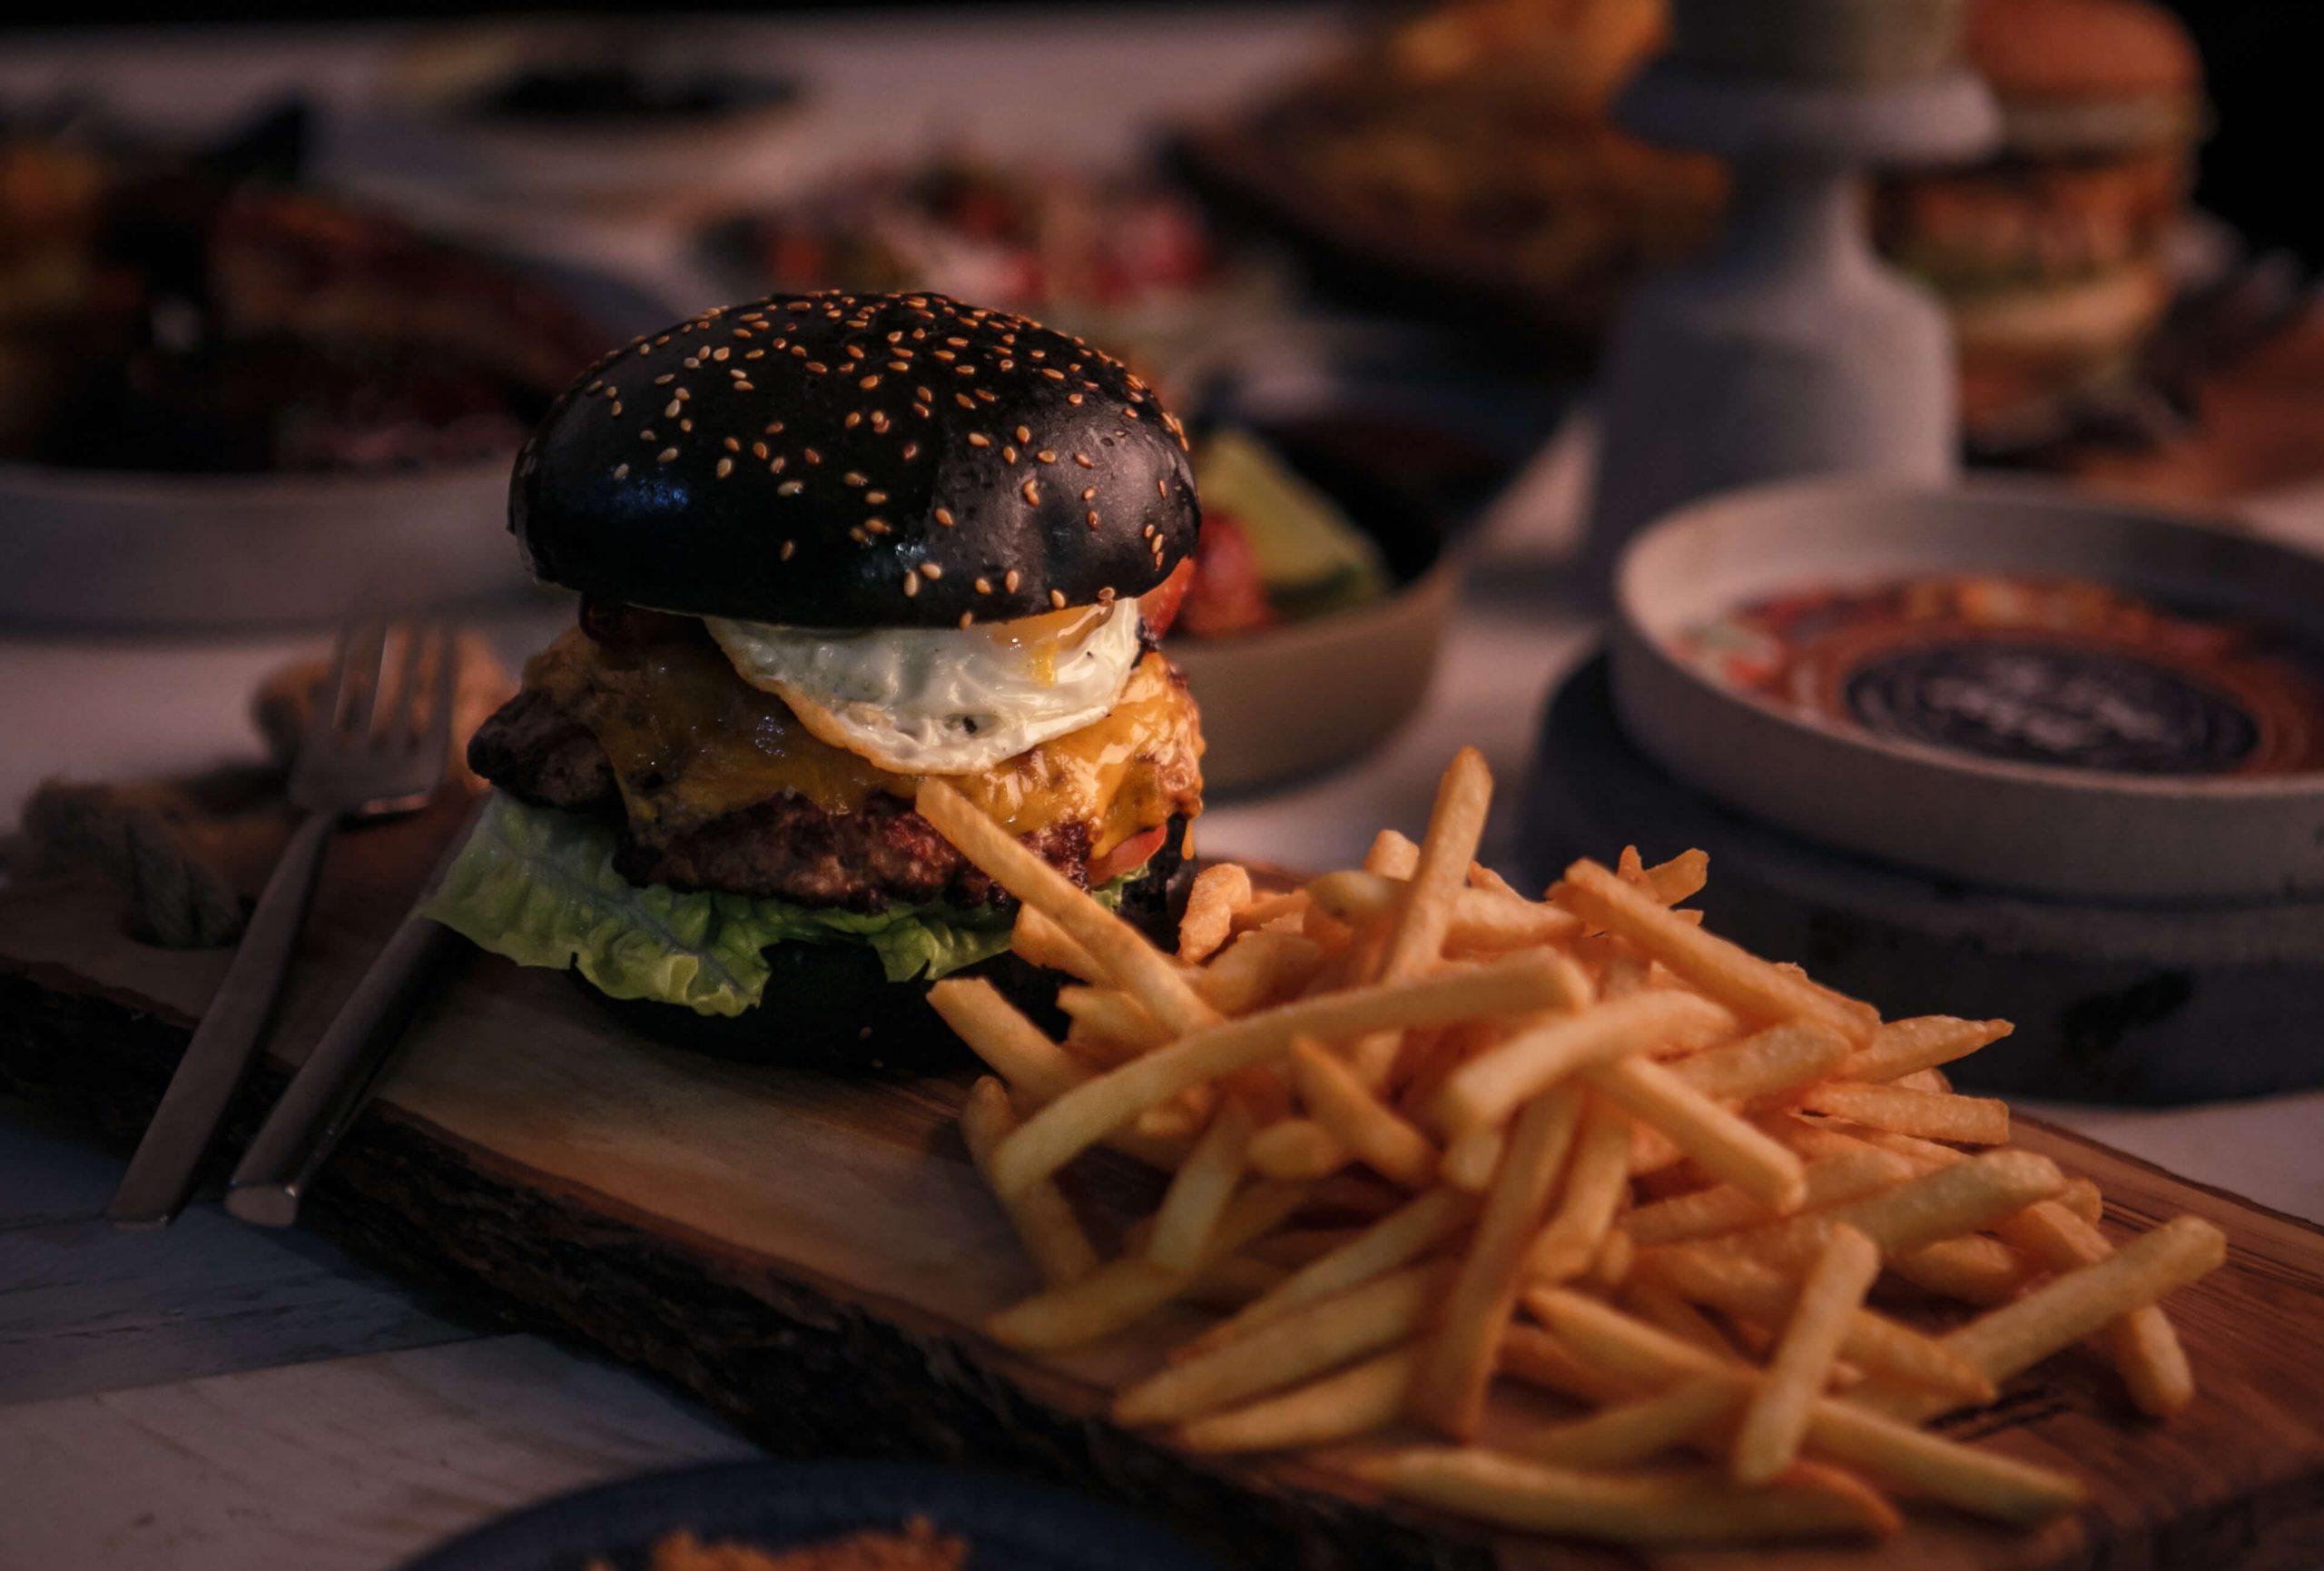 World of food - MAD-102